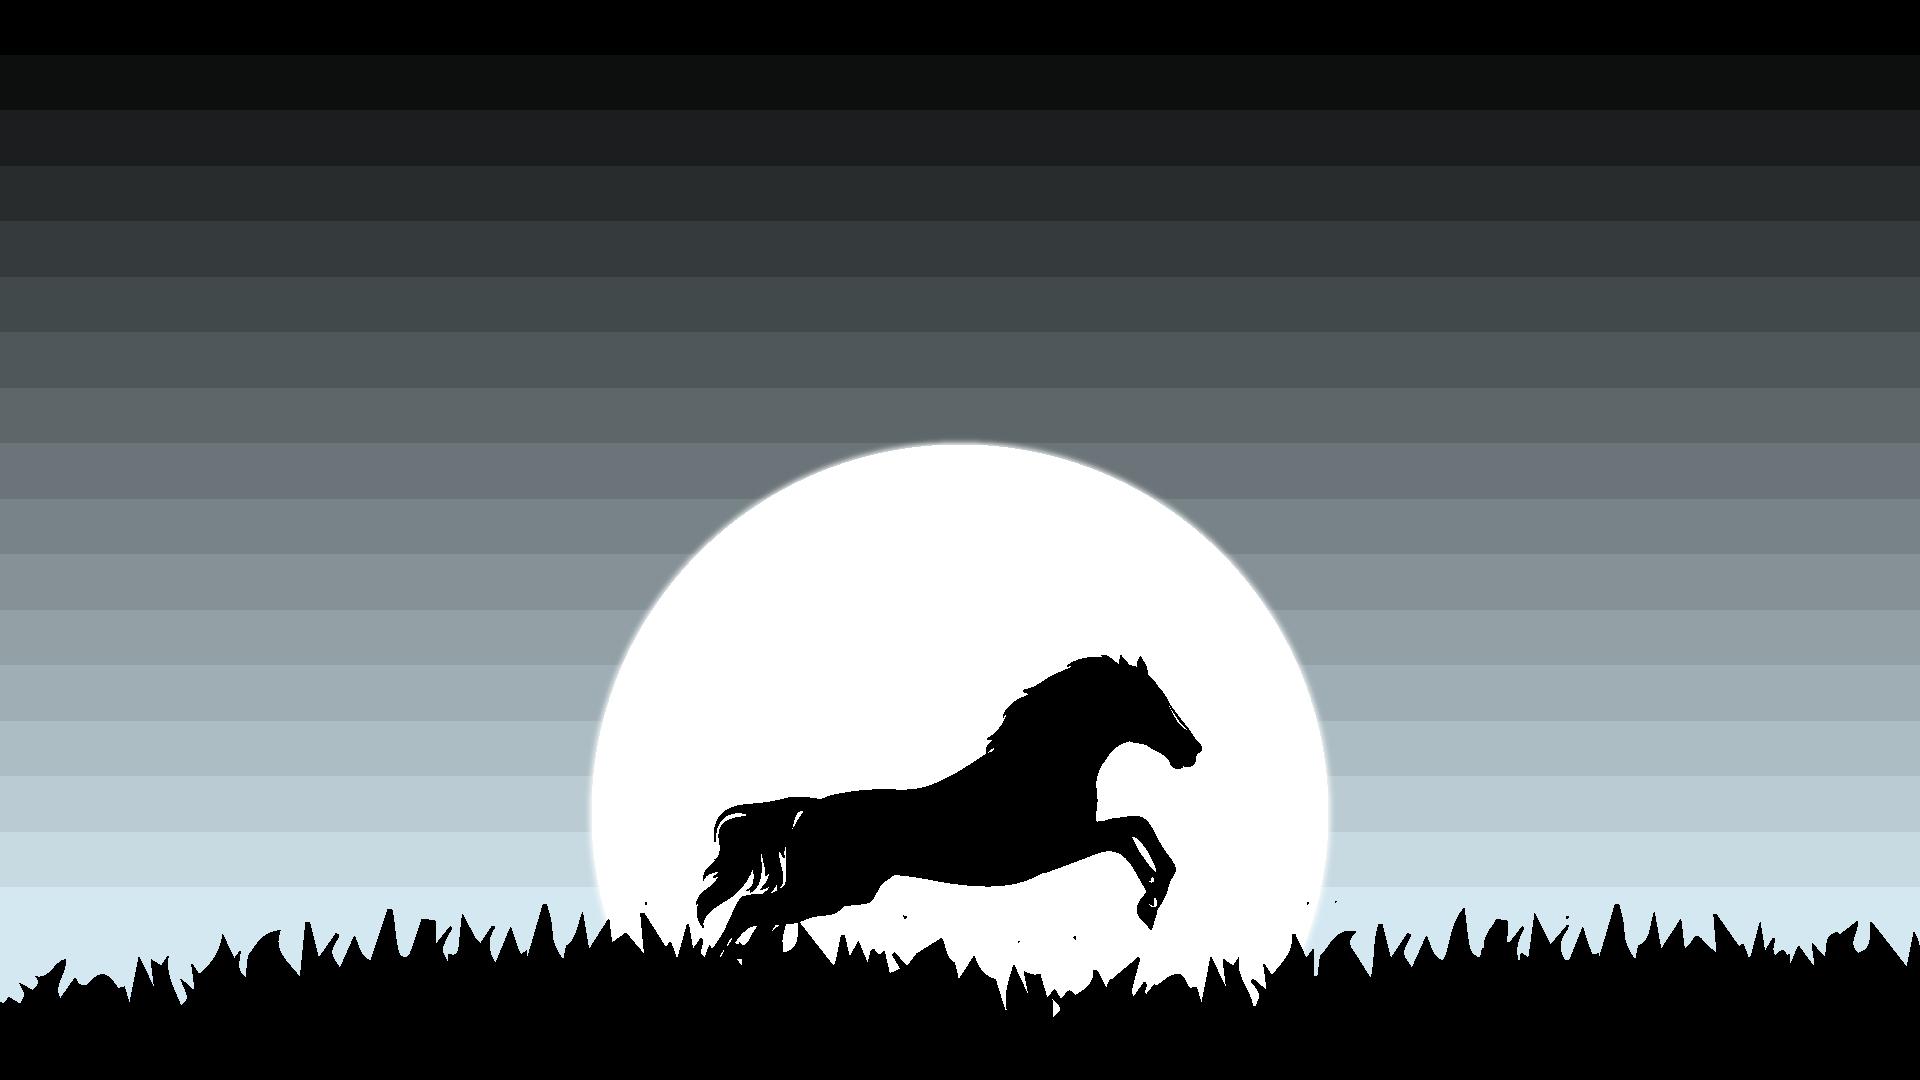 horse-wallpaper-4k